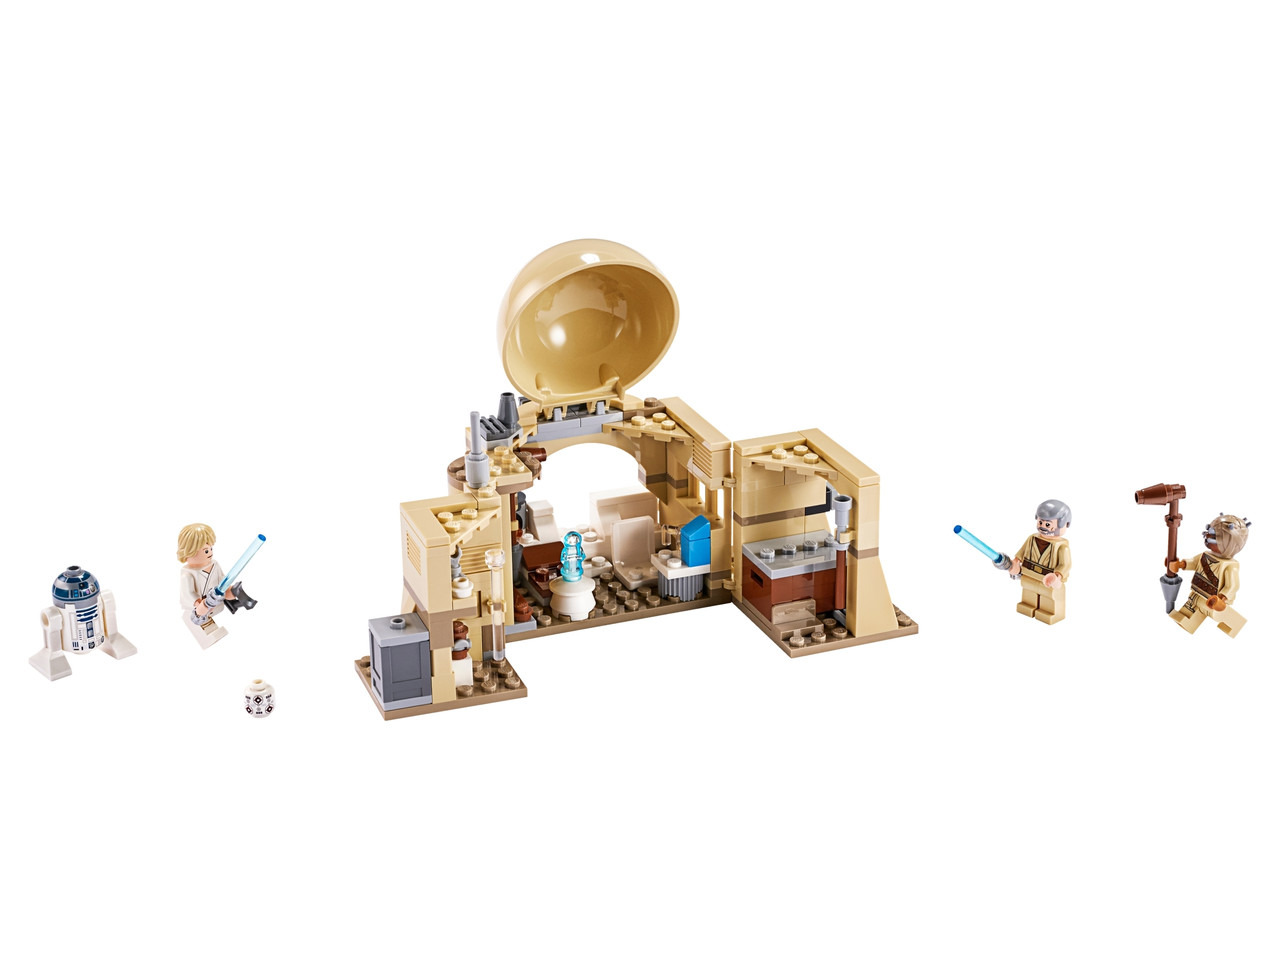 Конструктор LEGO Хижина Оби-Вана Кеноби 200 деталей (75270)